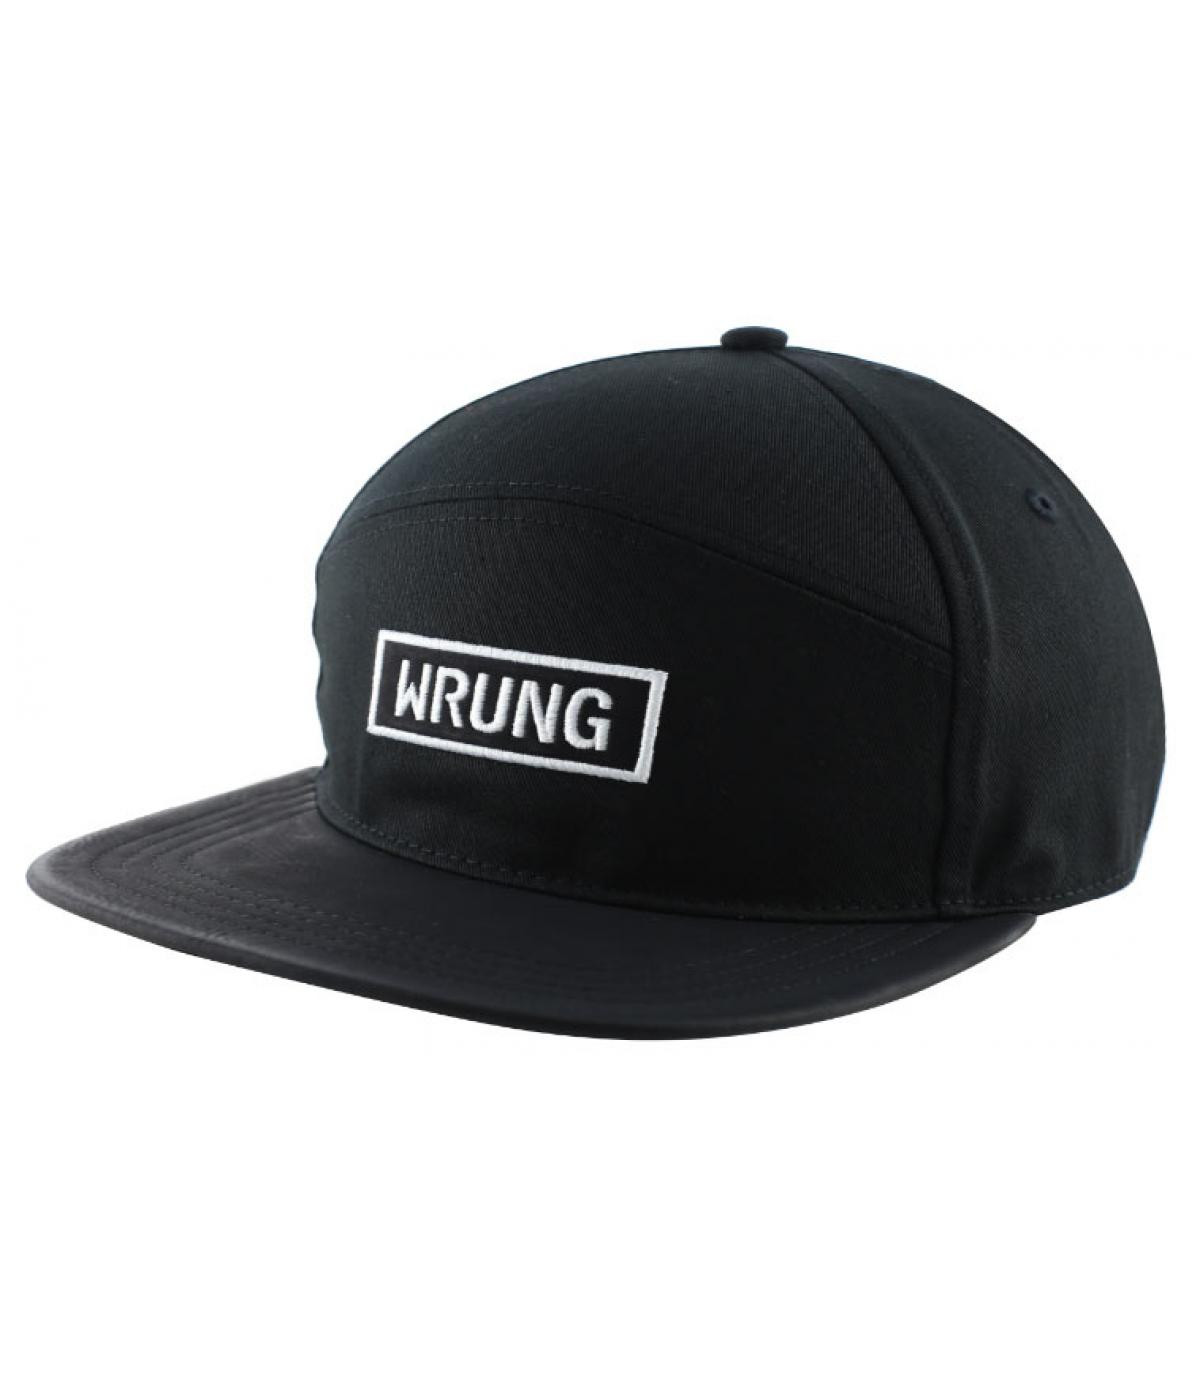 casquette logo rectangle Wrung